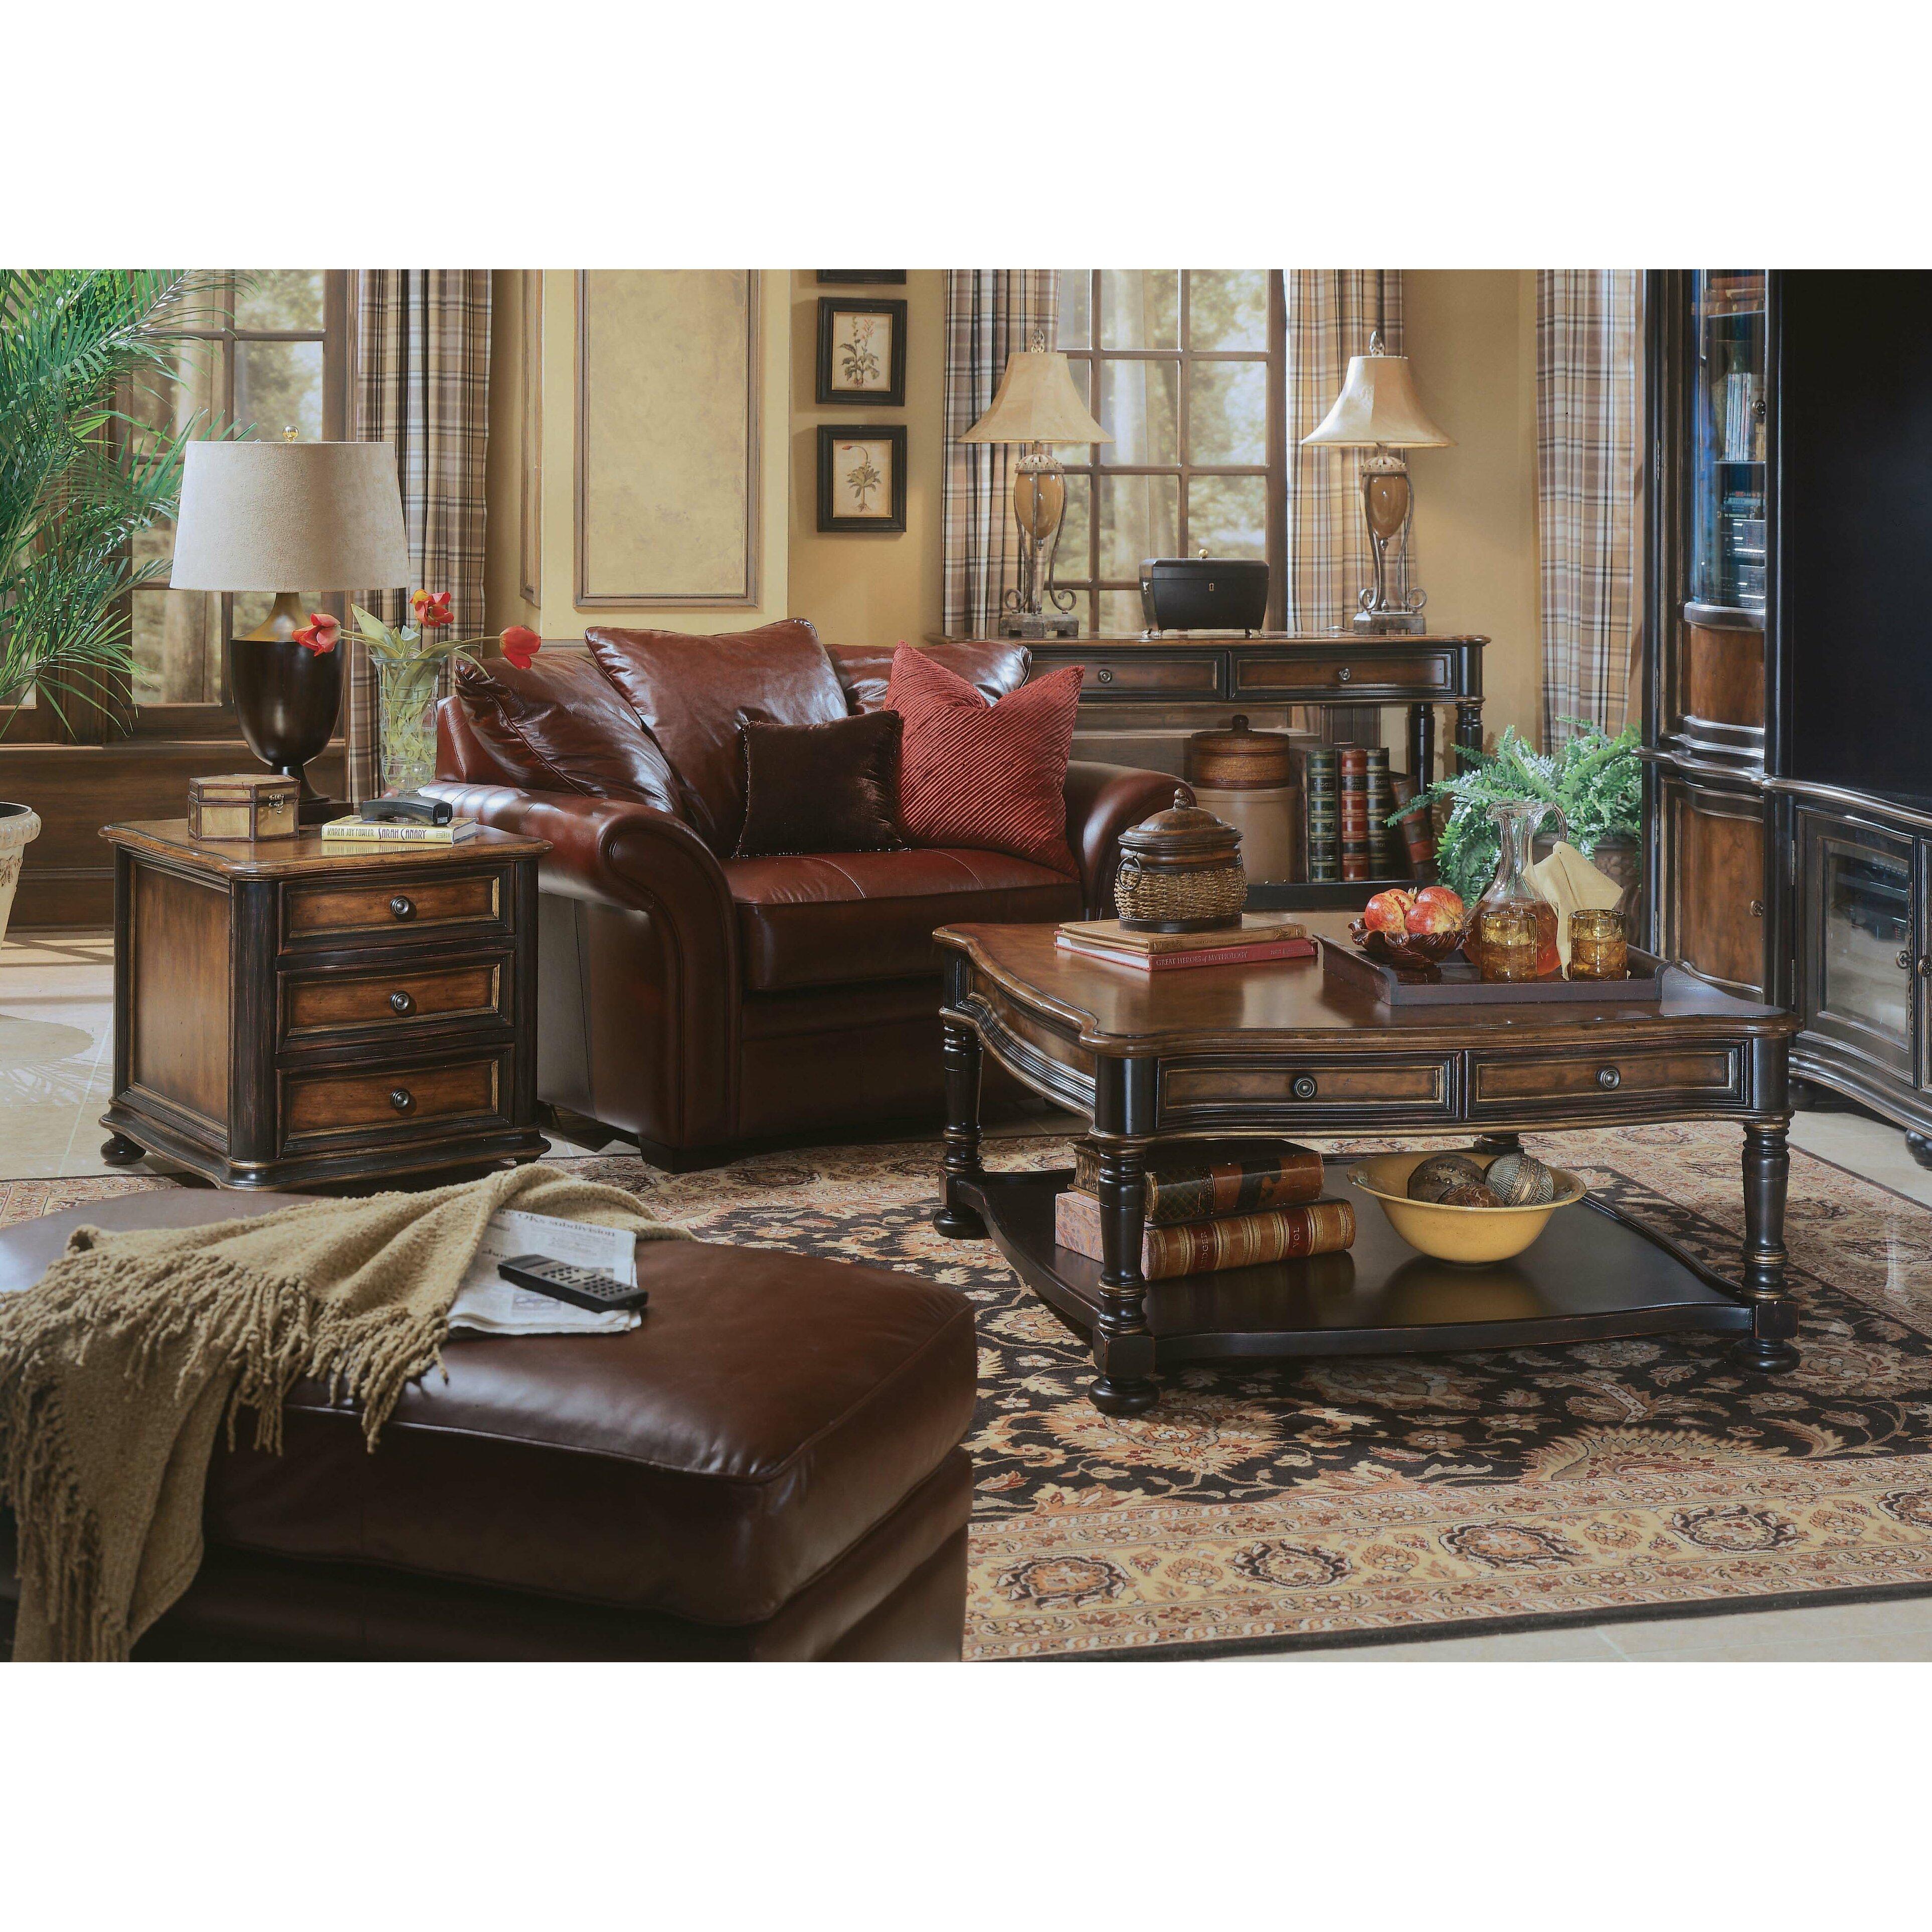 Rugs Furniture: Hooker Furniture Preston Ridge Coffee Table & Reviews